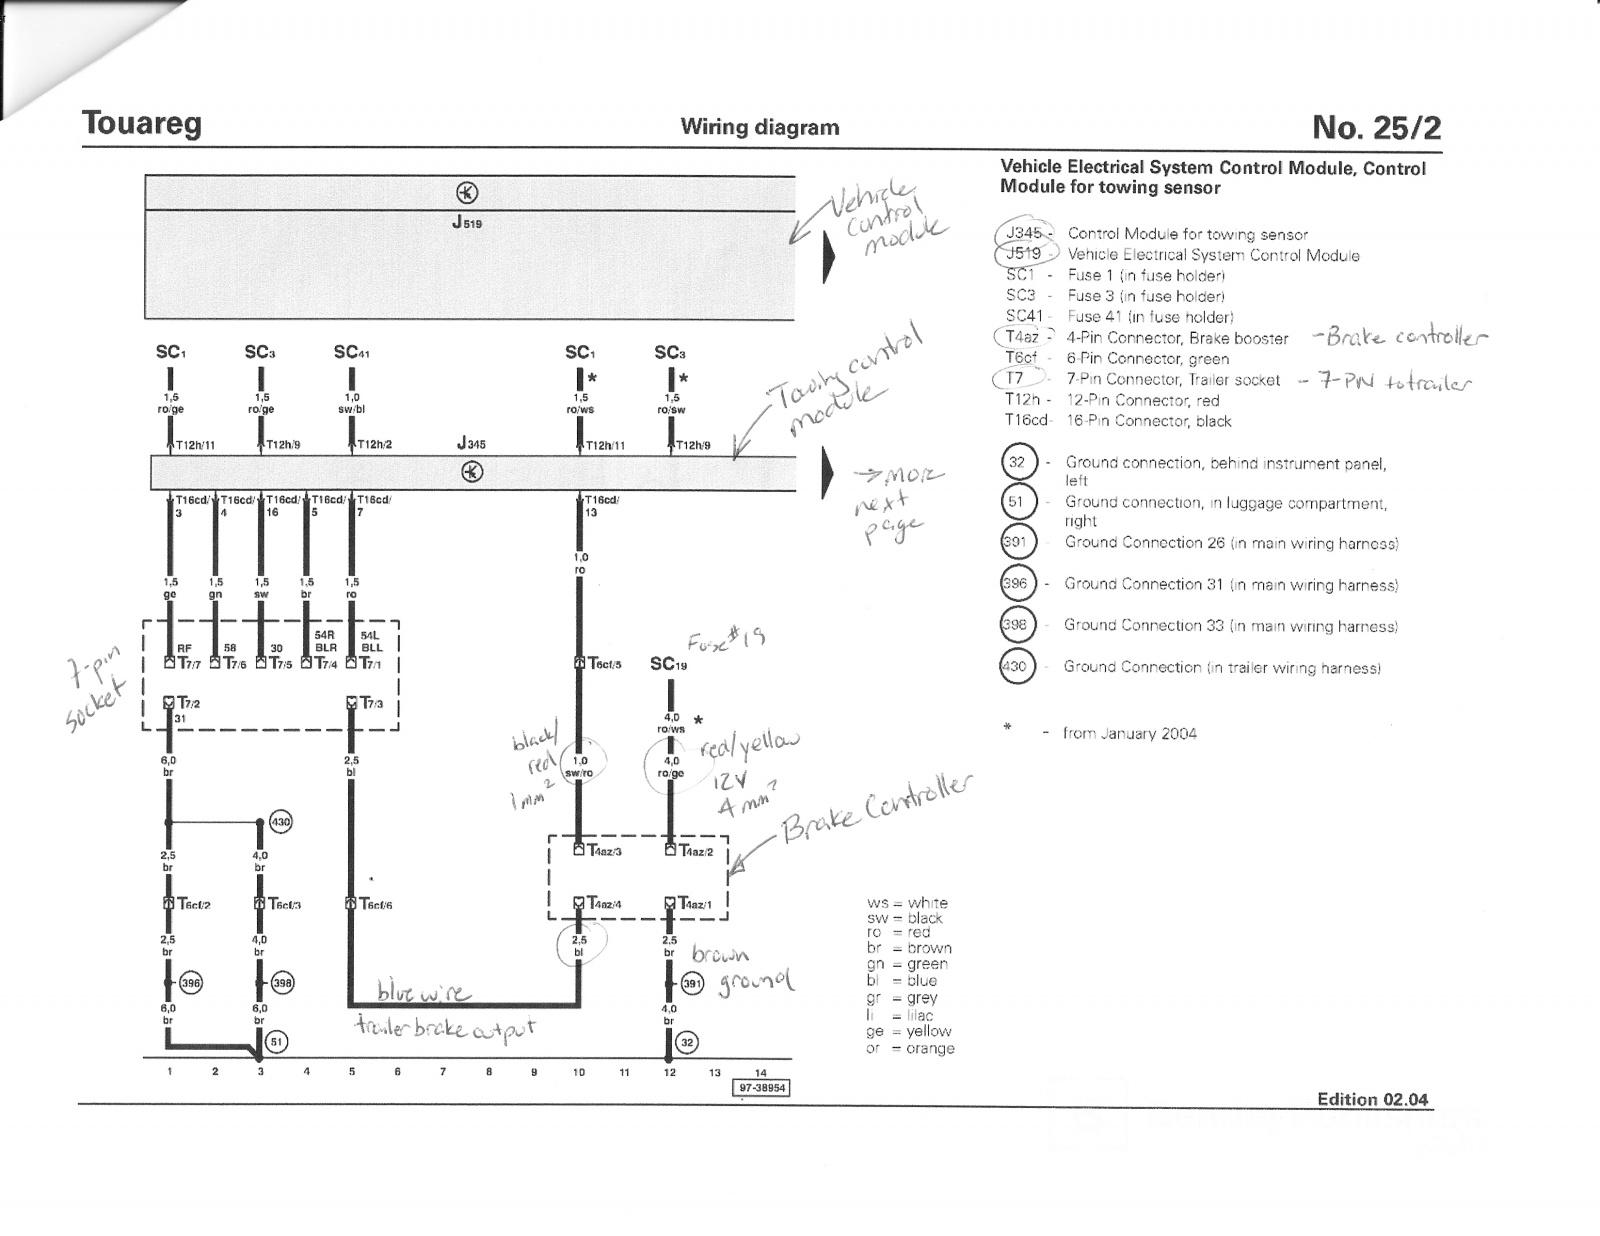 volkswagen touareg wiring diagram